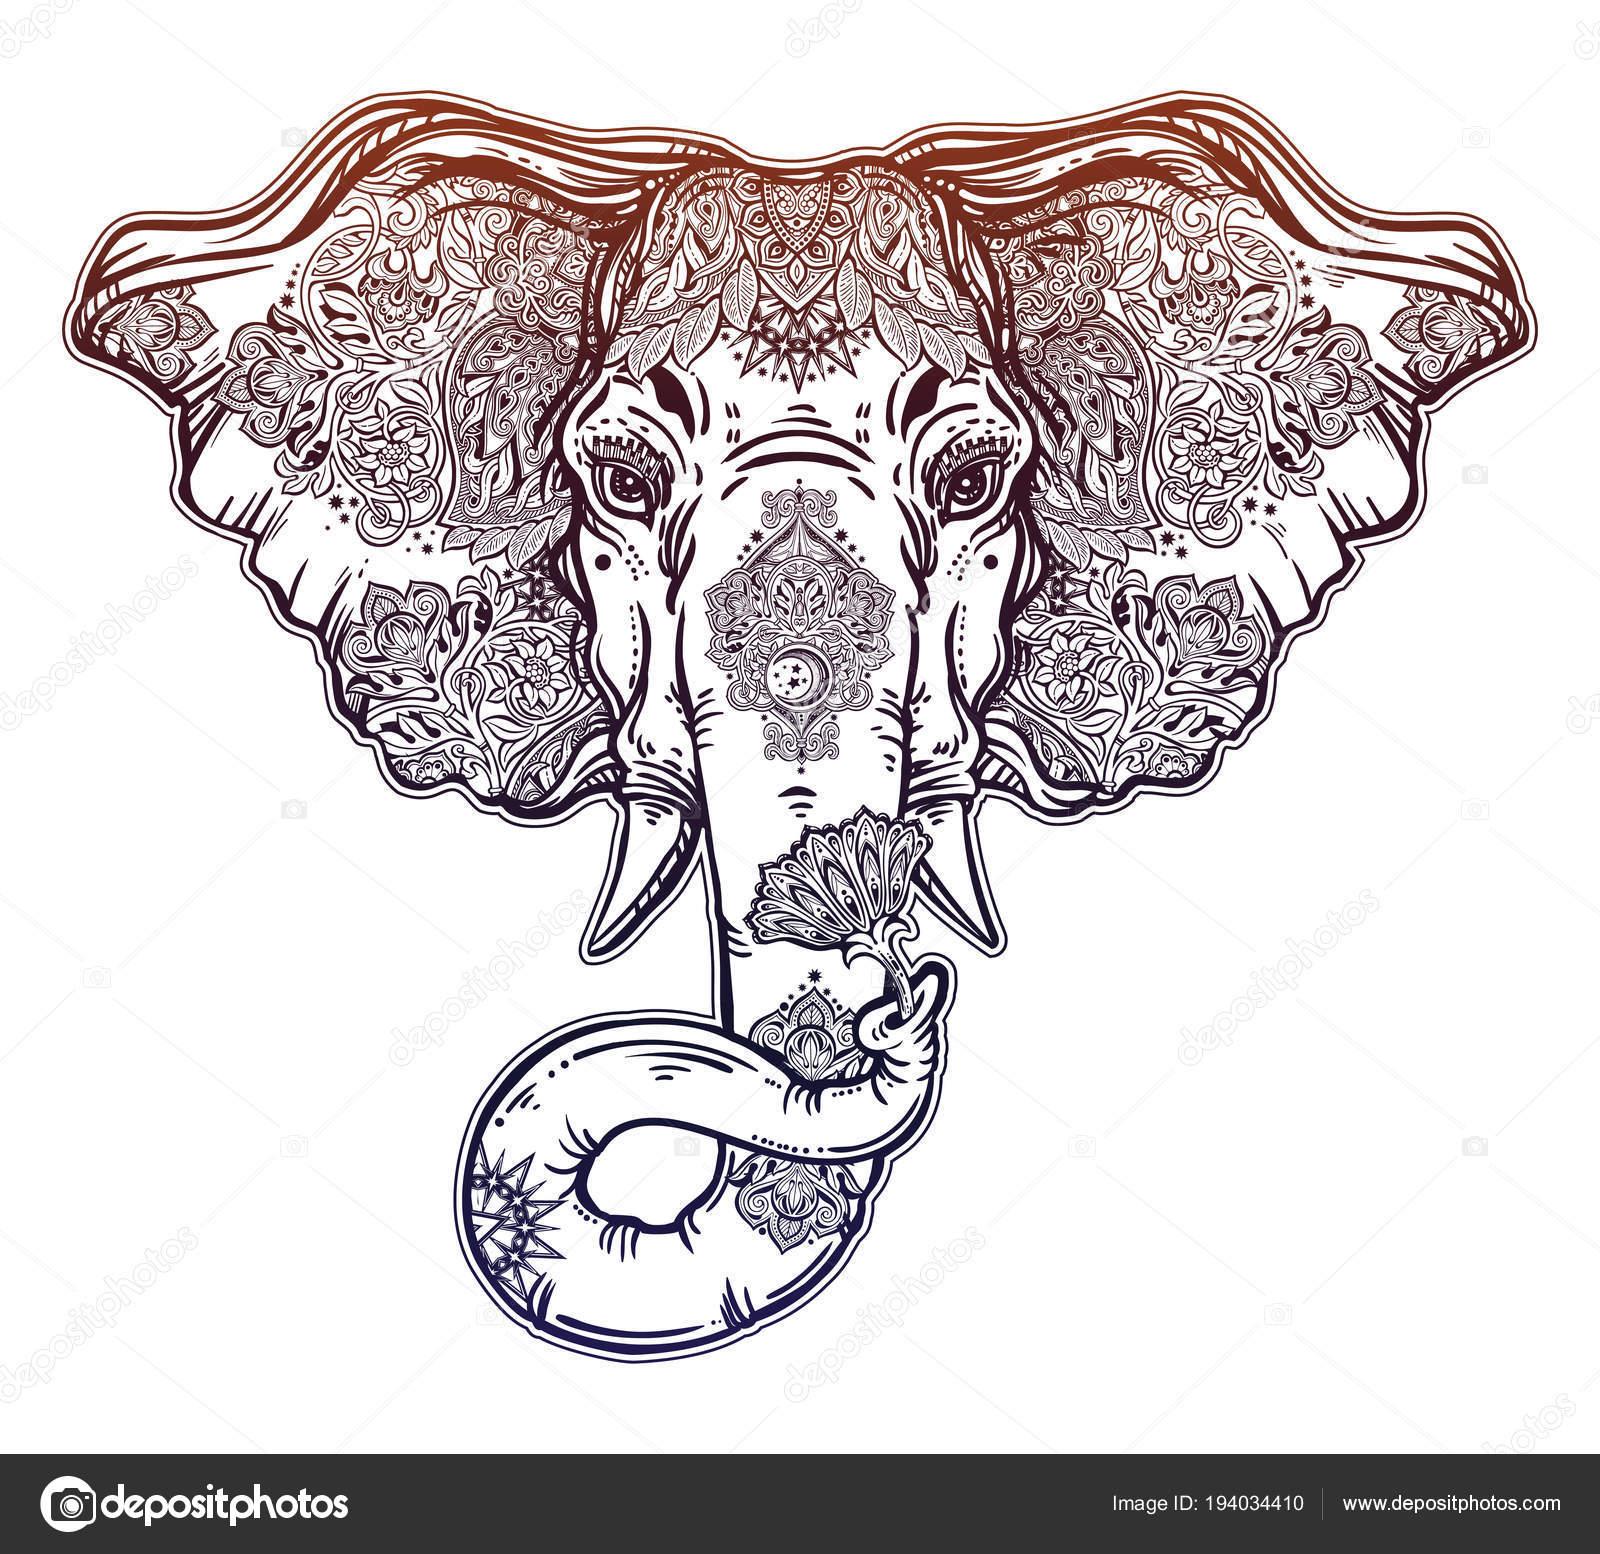 Decorative elephant portrait with beautiful with lotus flower ornate inked decorative elephant portrait with beautiful lotus flower lord ganesha african indian arab tribal spiritual animal mightylinksfo